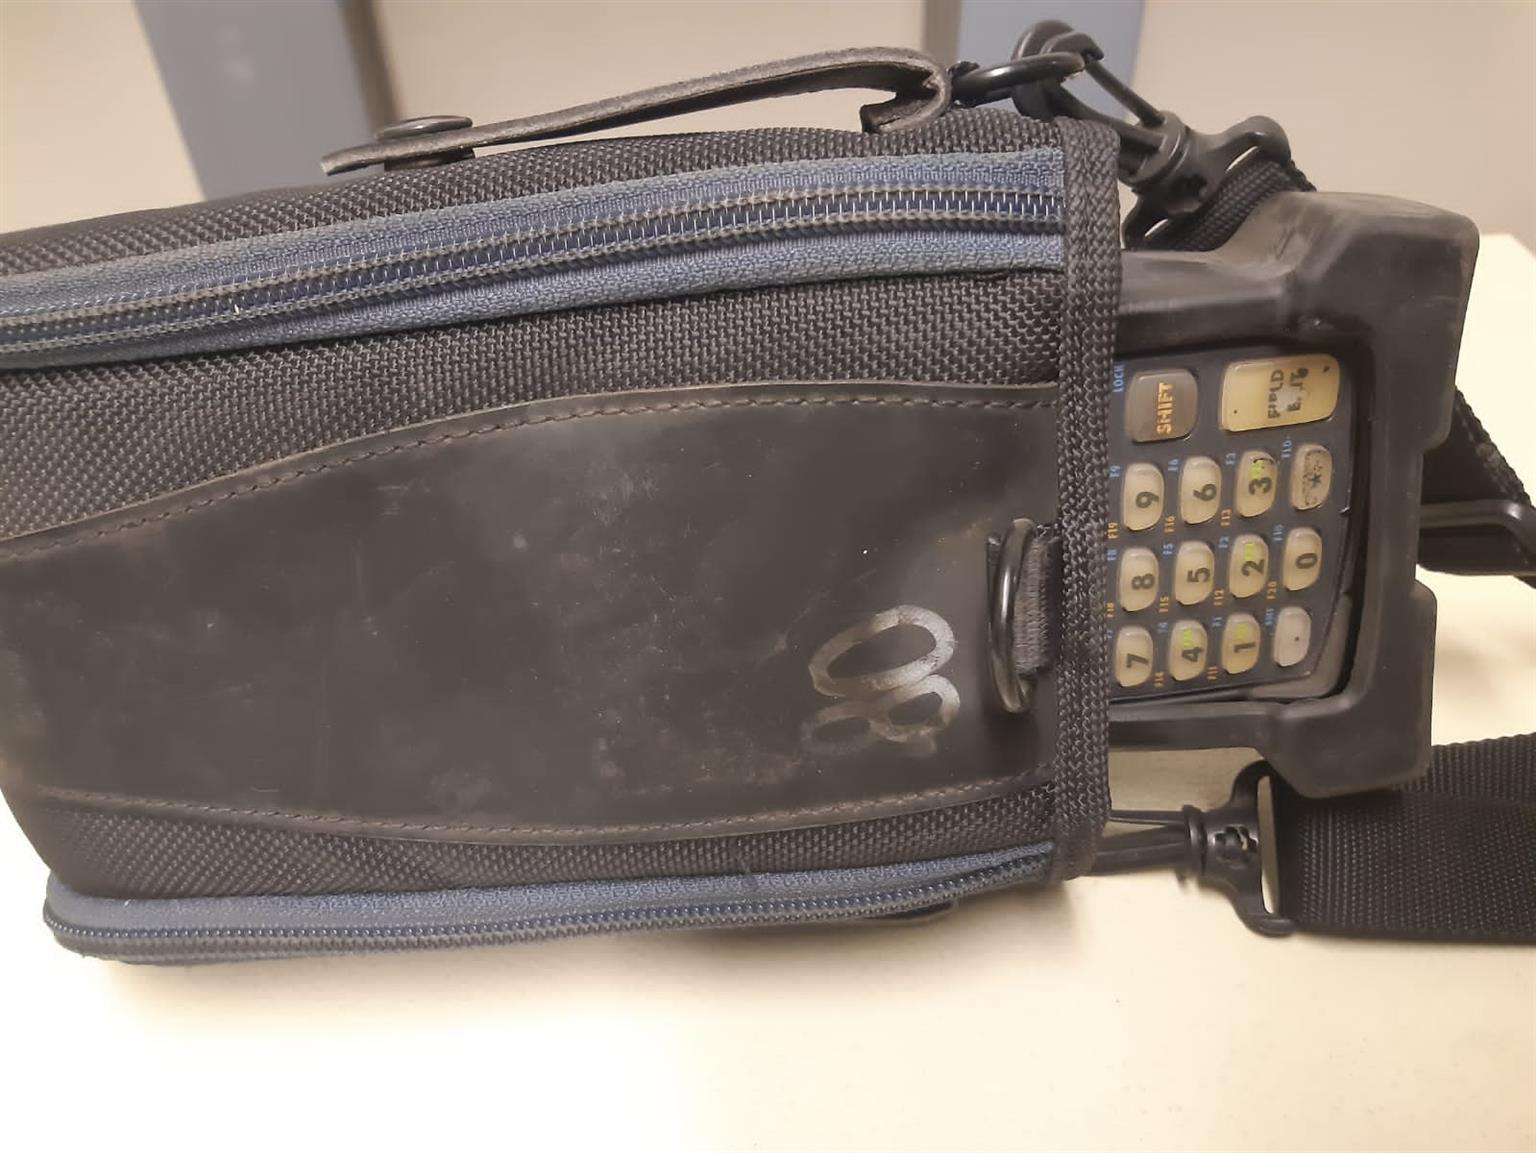 Motorolla barcode handheld systems